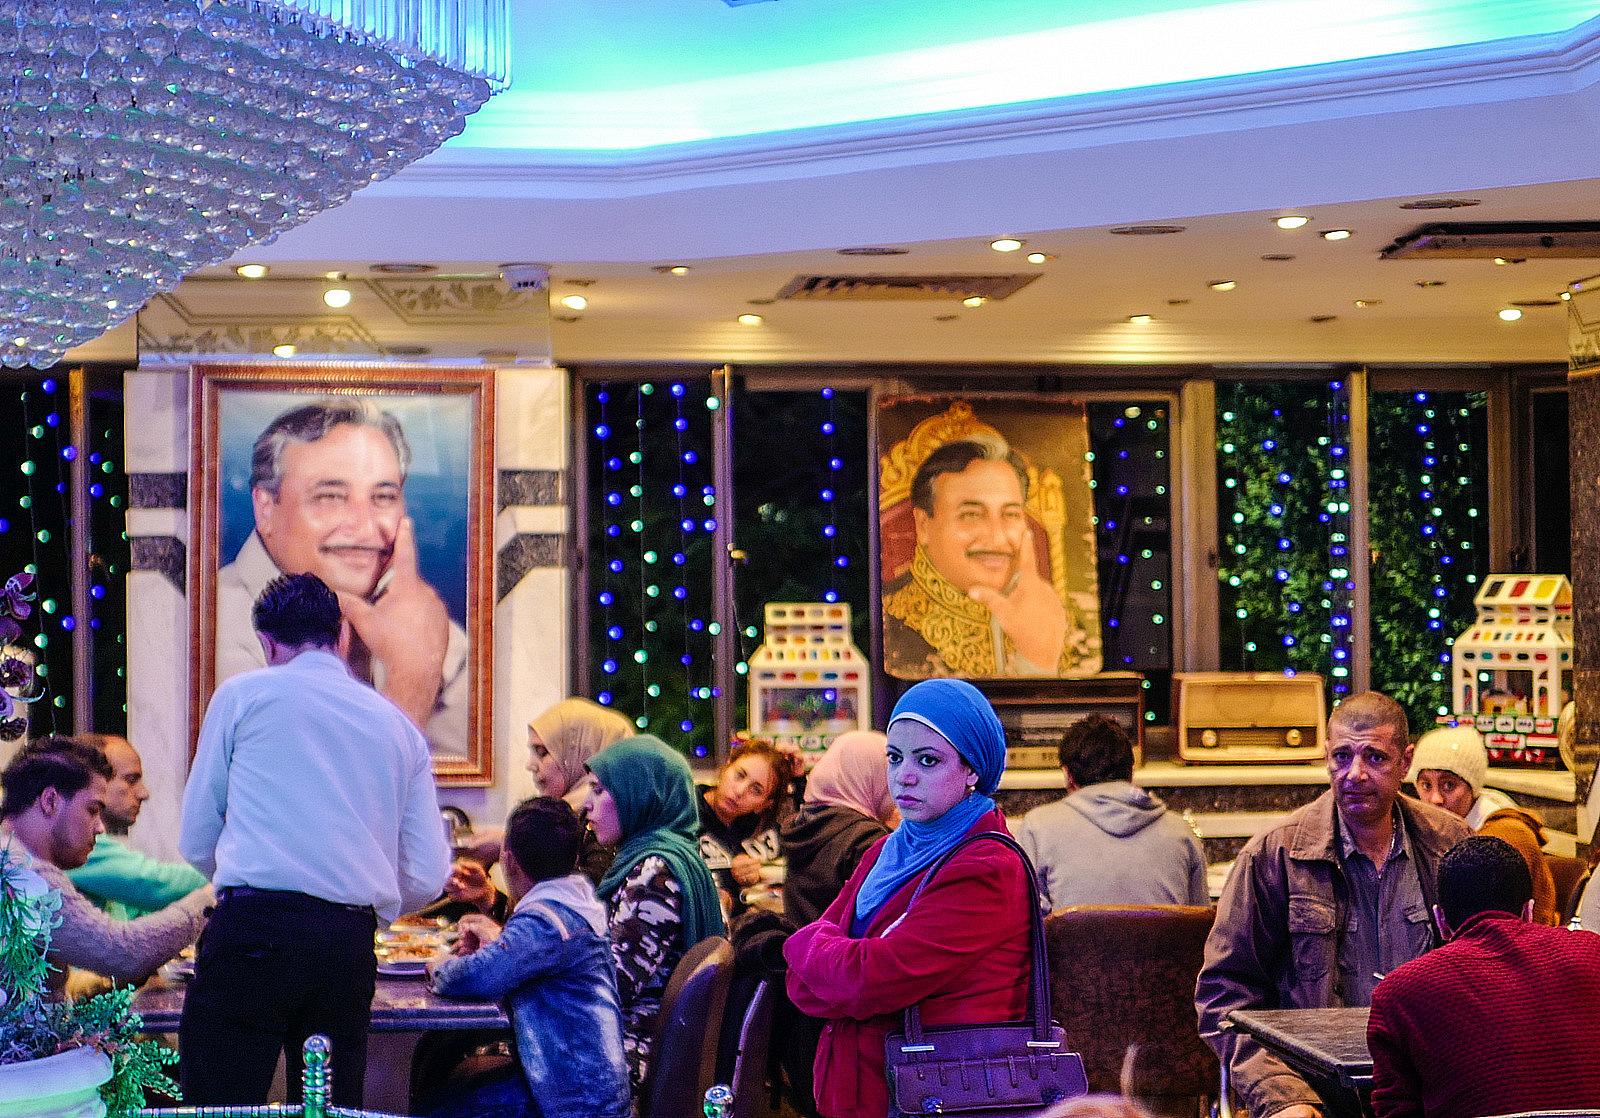 Koshari: Abou Tarek & Zizo, Cairo, Egypt